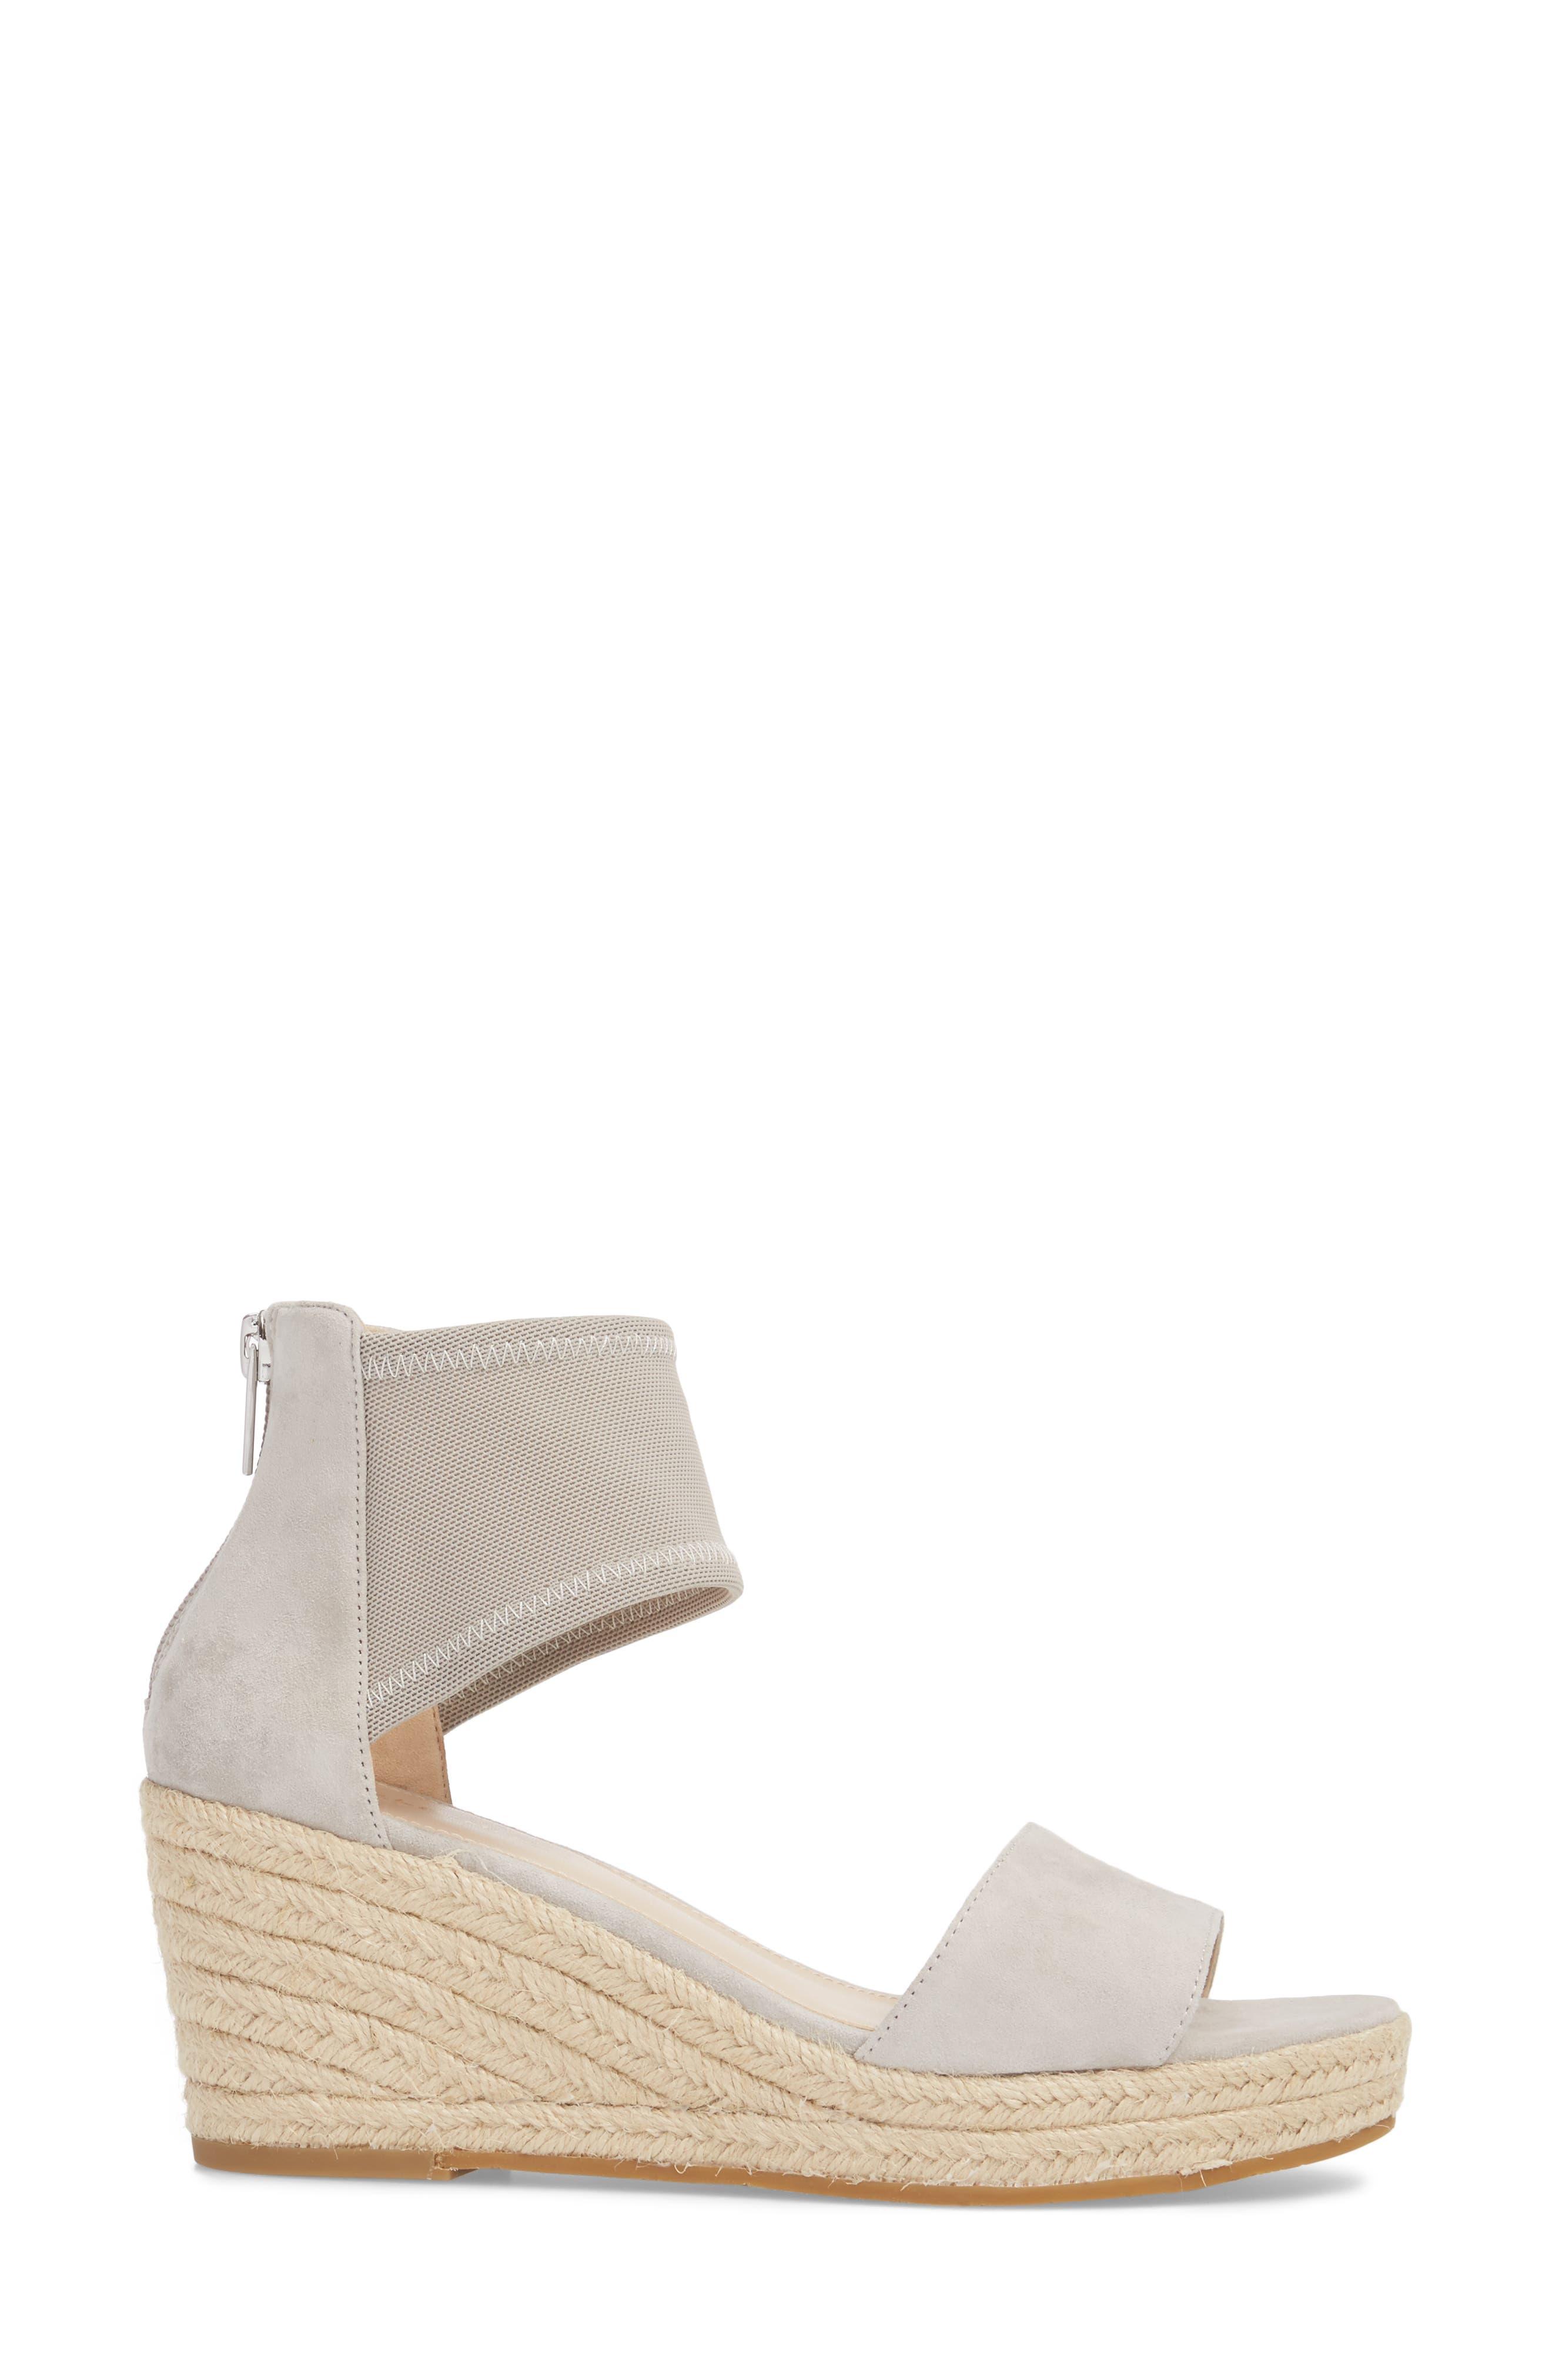 Kona Platform Wedge Sandal,                             Alternate thumbnail 3, color,                             CLOUD SUEDE